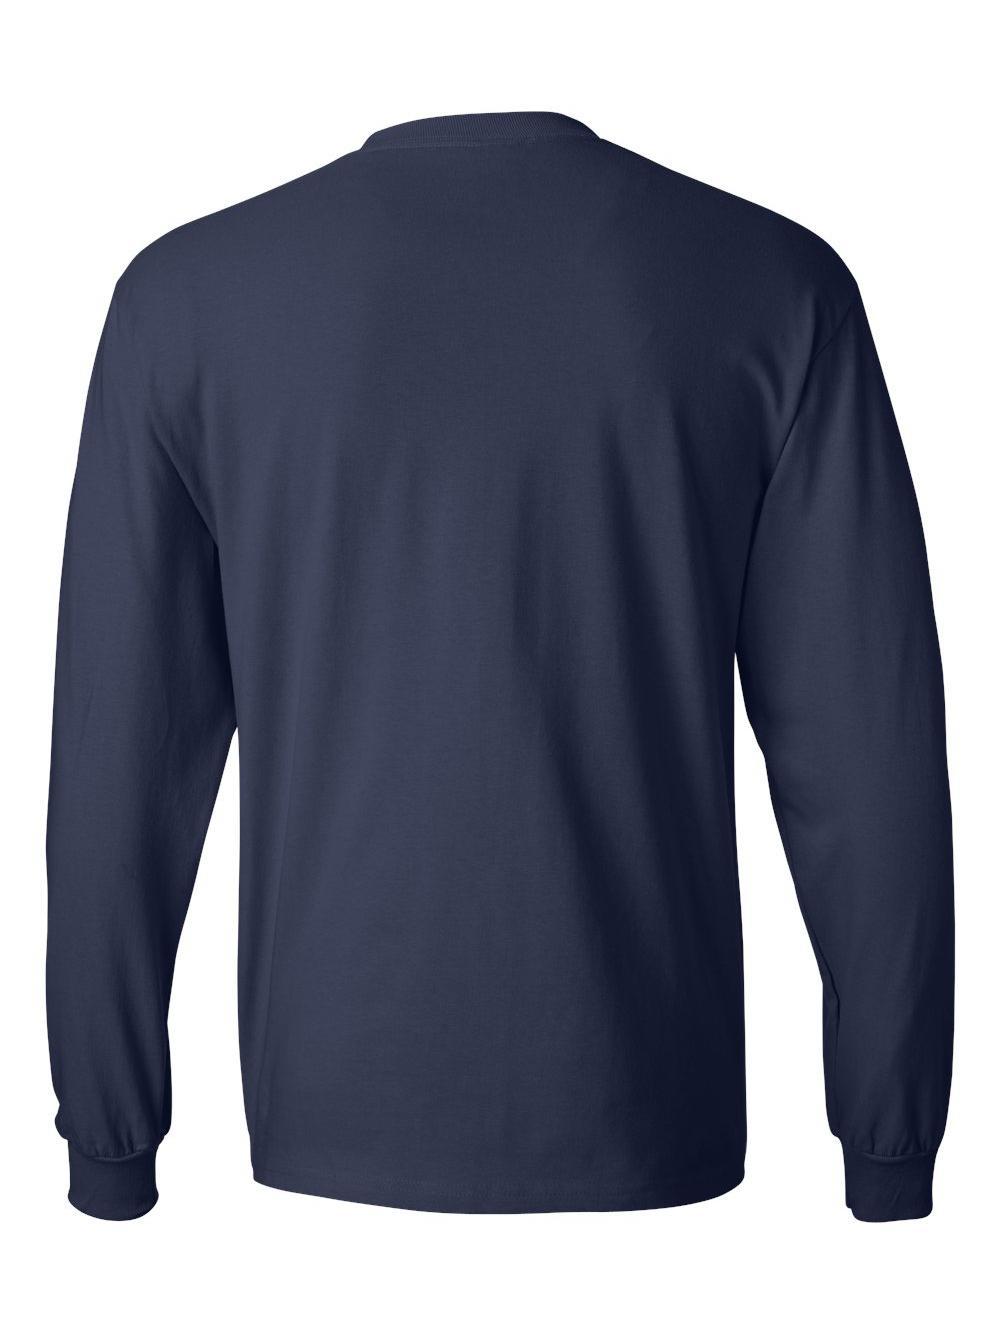 Hanes-Beefy-T-Long-Sleeve-T-Shirt-5186 thumbnail 40